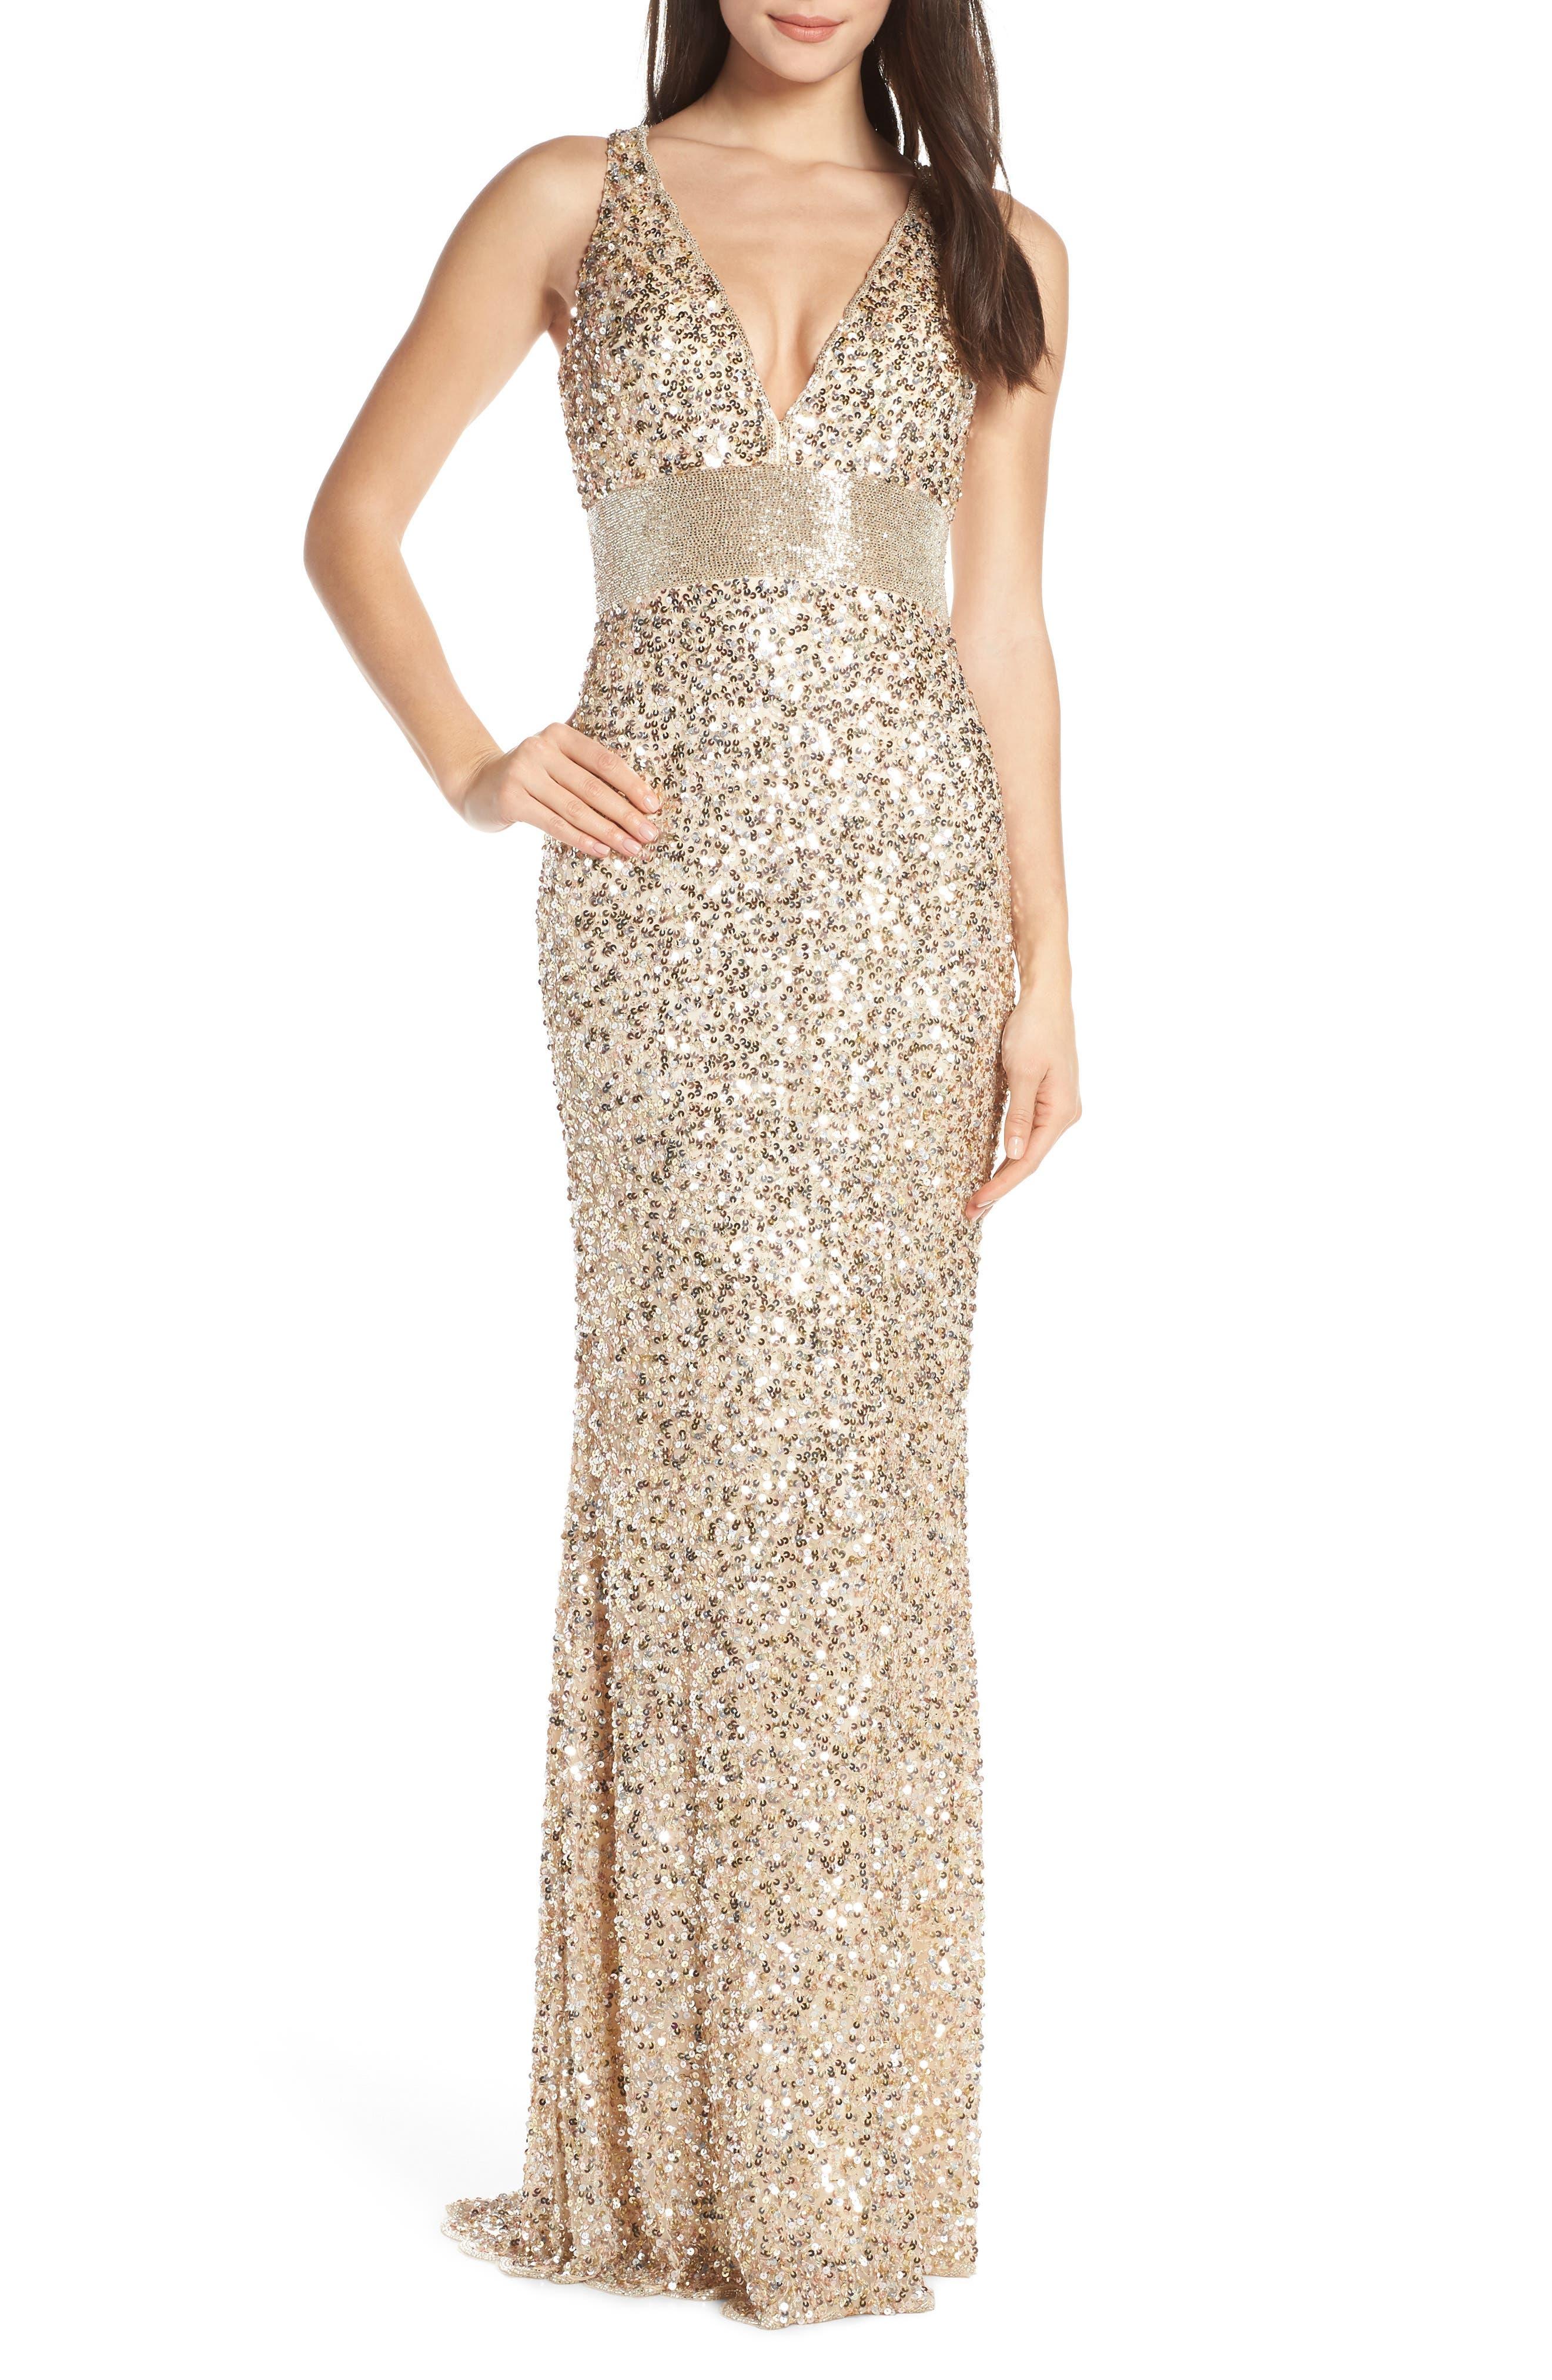 70s Prom, Formal, Evening, Party Dresses Womens MAC Duggal Beaded Waist Evening Dress $338.00 AT vintagedancer.com